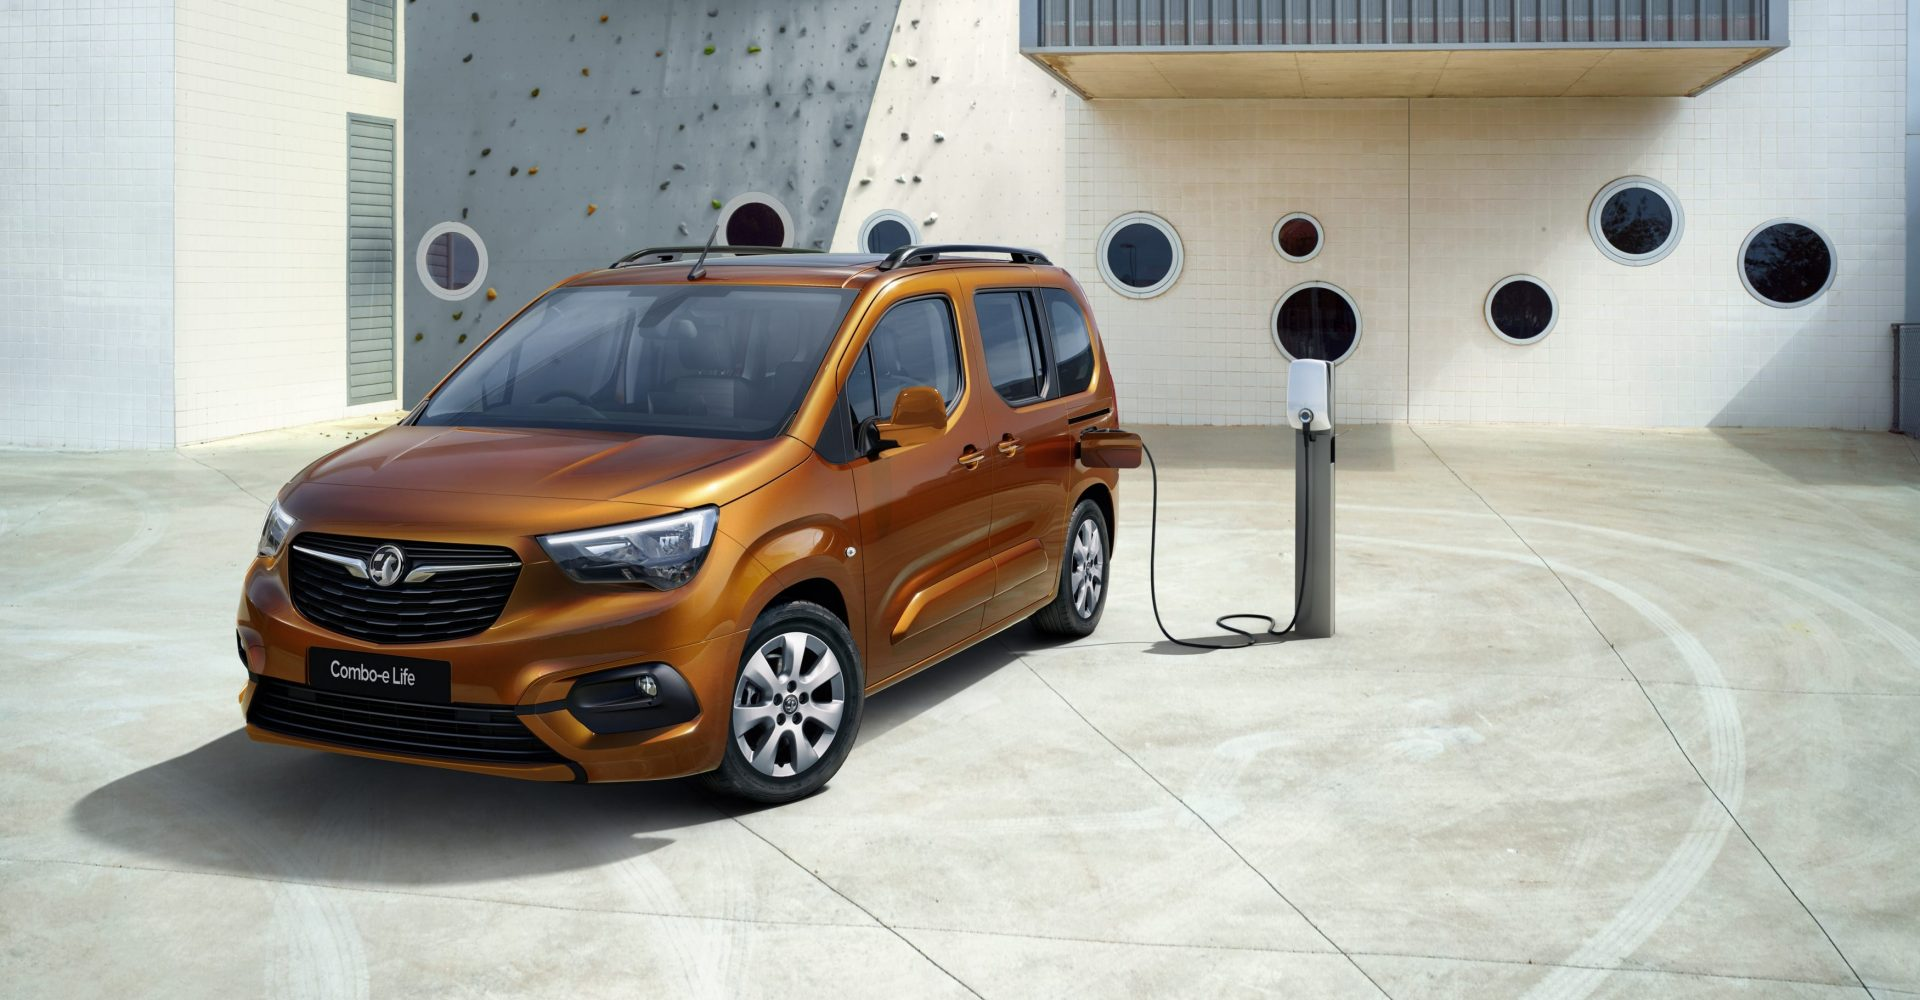 Vauxhall reveals new Combo-e Life with 174-mile range